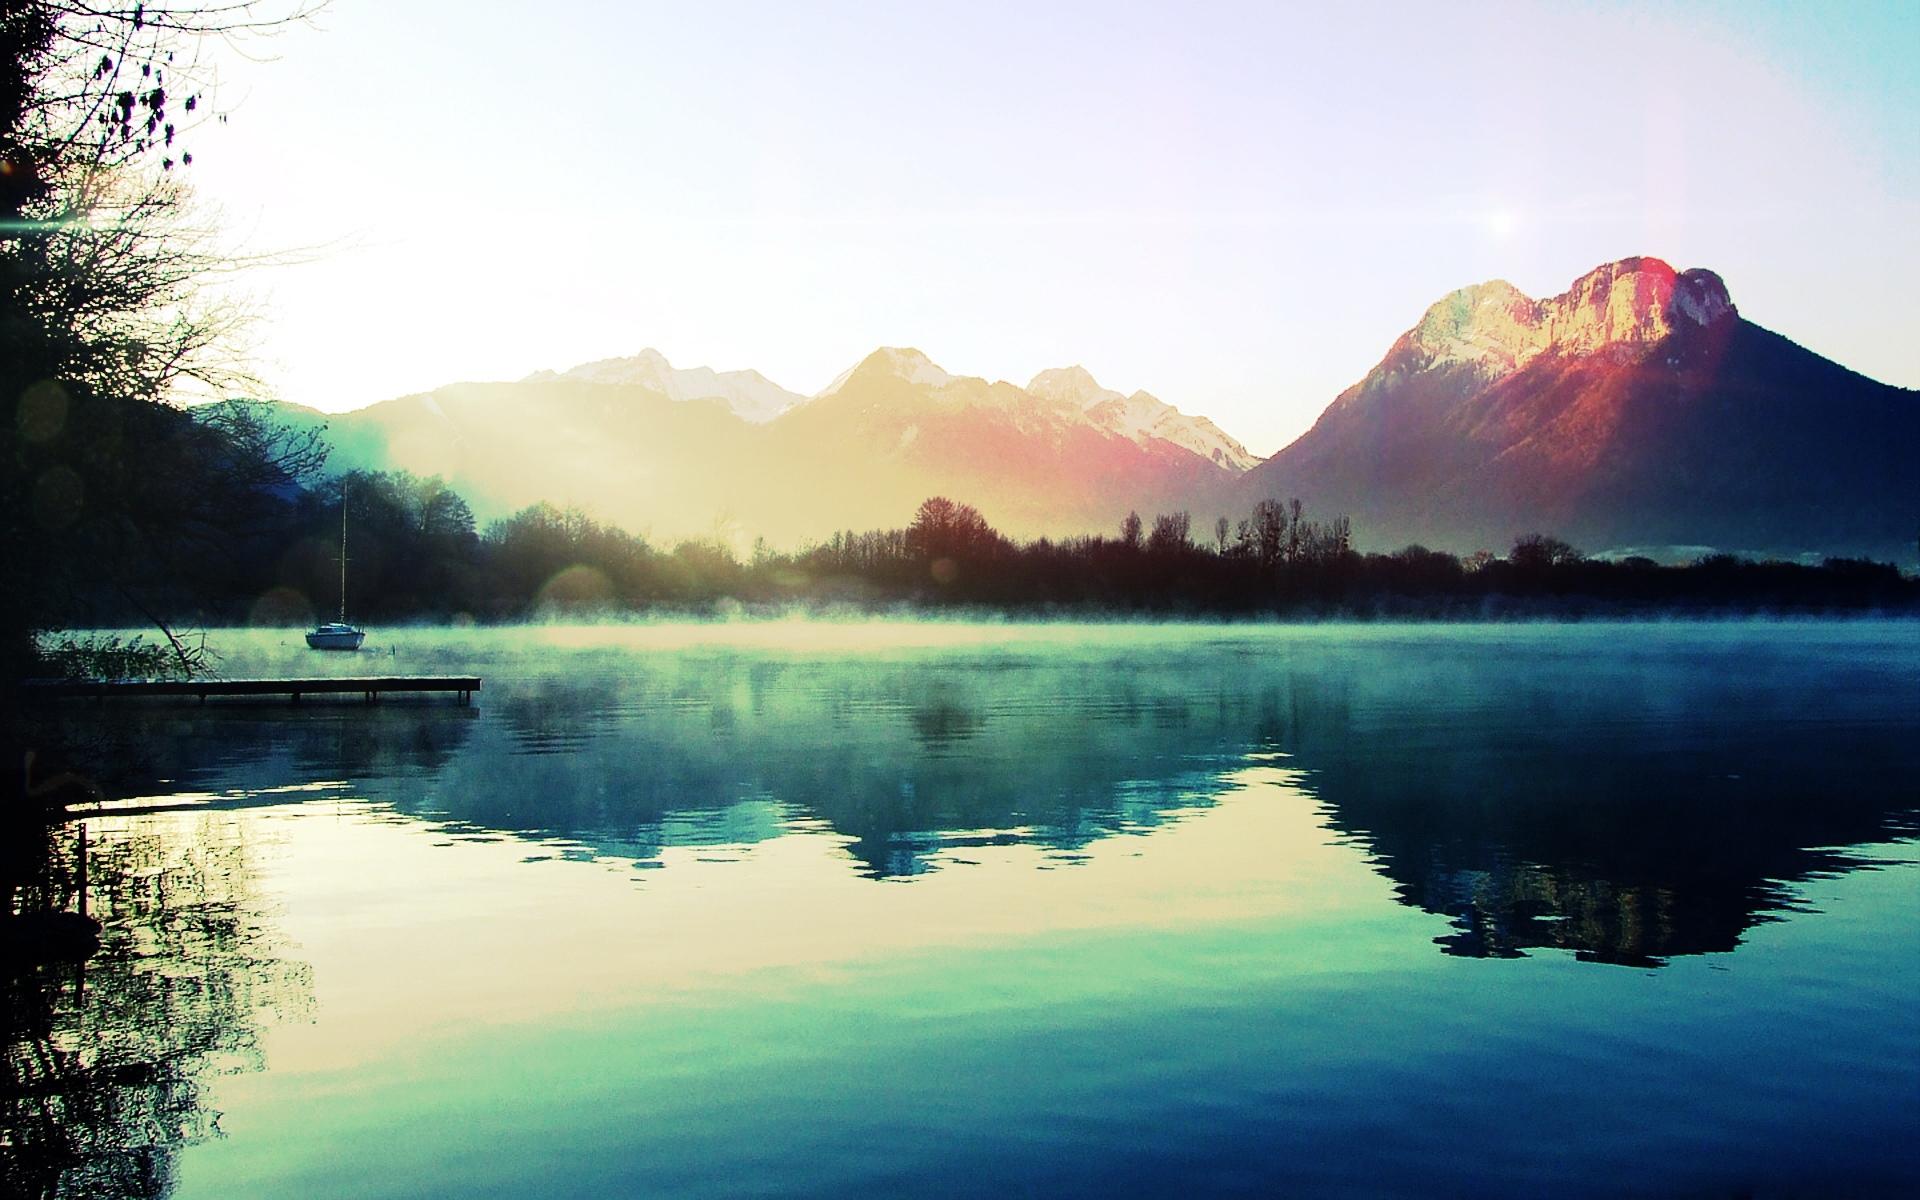 Beautiful Landscape Backgrounds Widescreen 2 HD Wallpapers